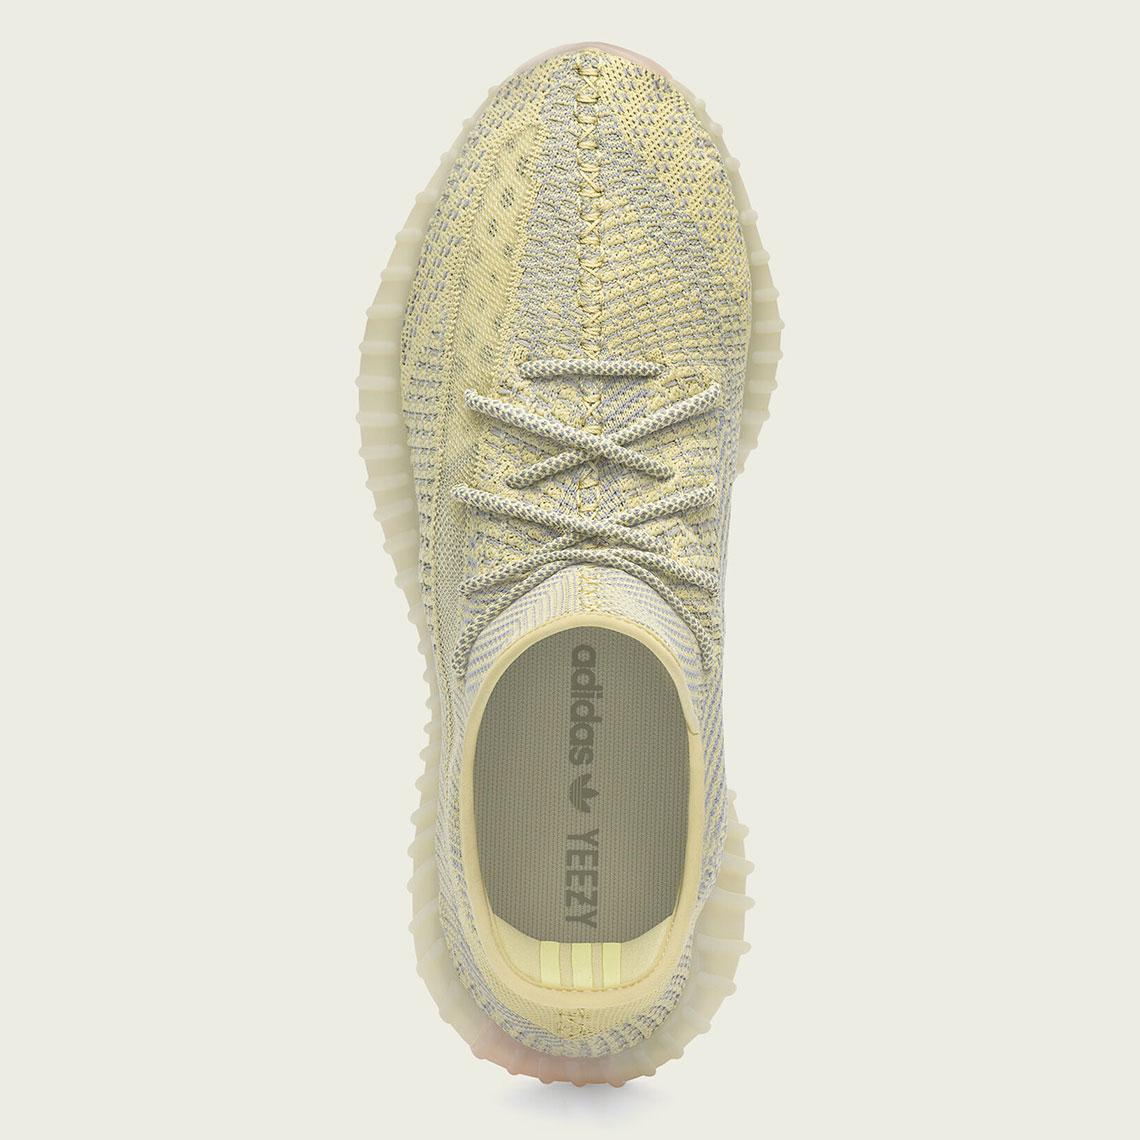 adidas Yeezy Boost 350 V2 BlackWhite Release Info